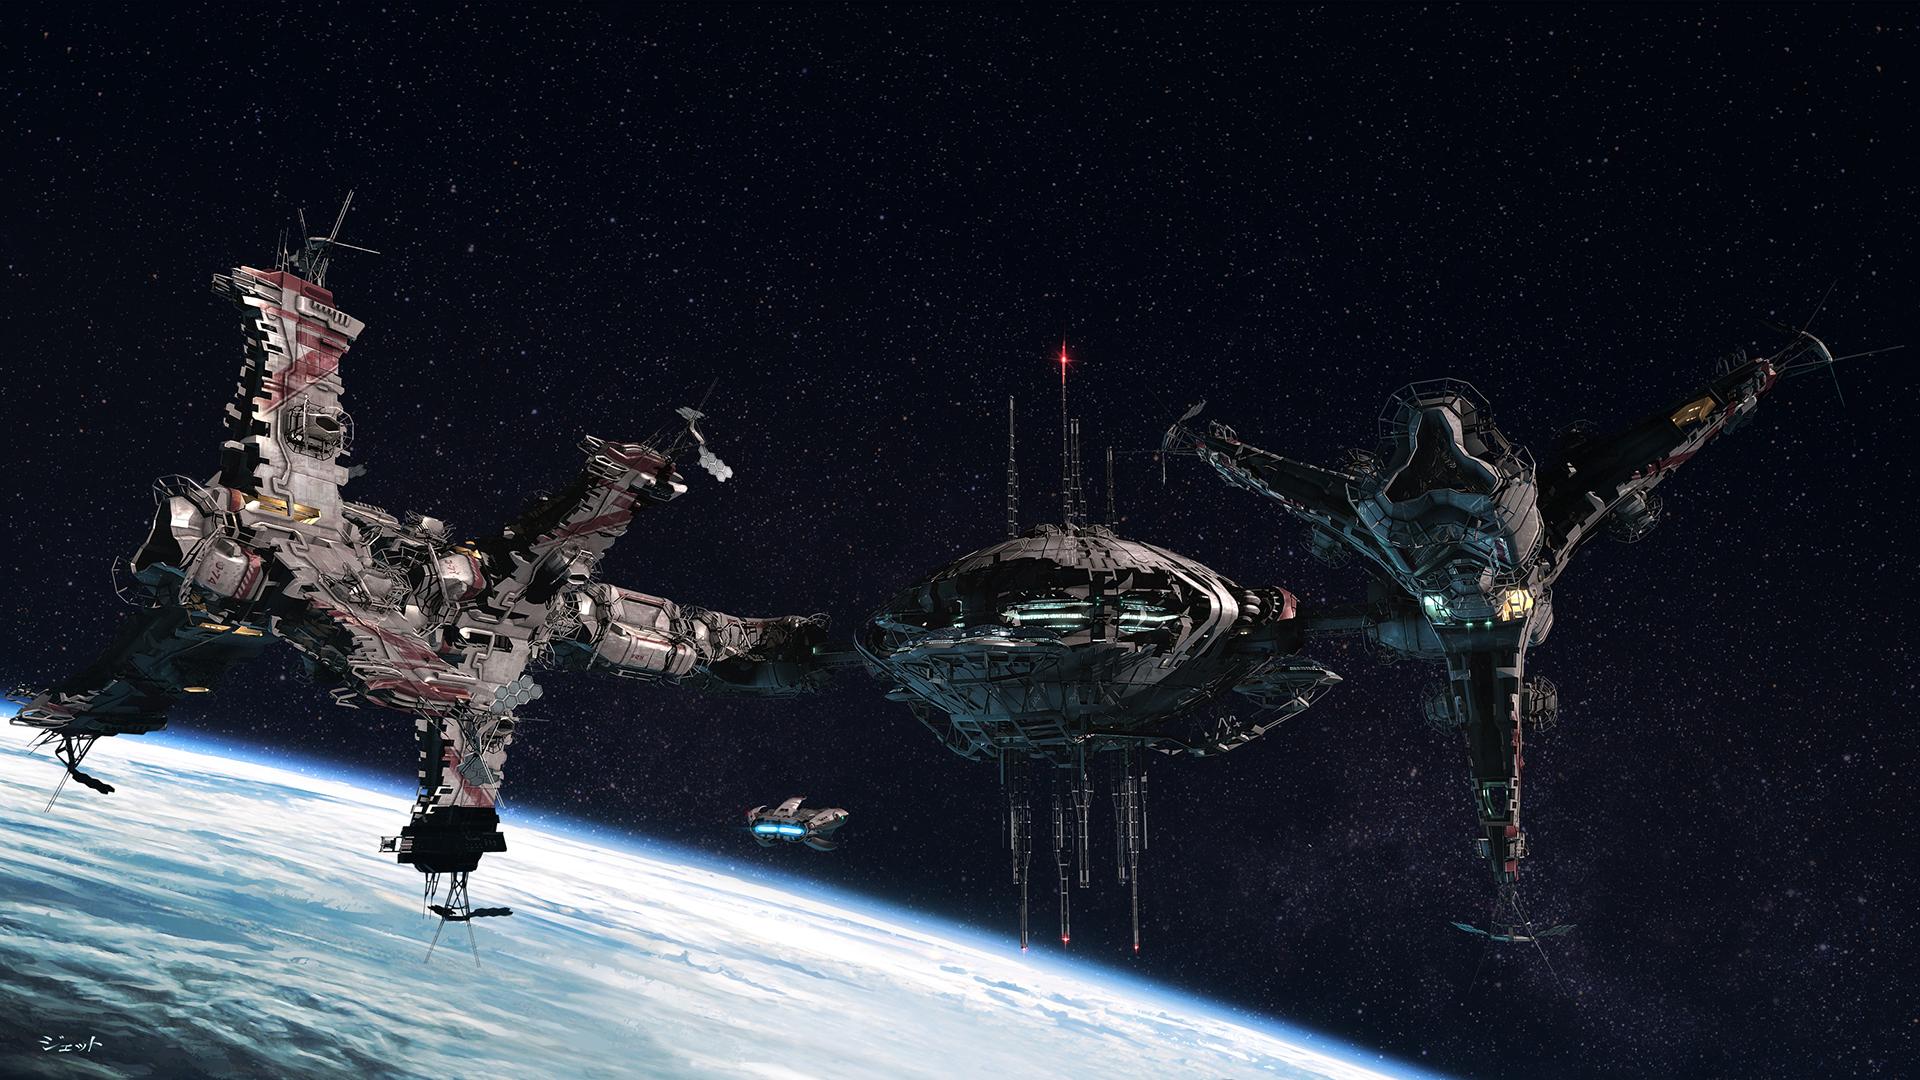 Sci Fi - Battlestar Galactica  Wallpaper